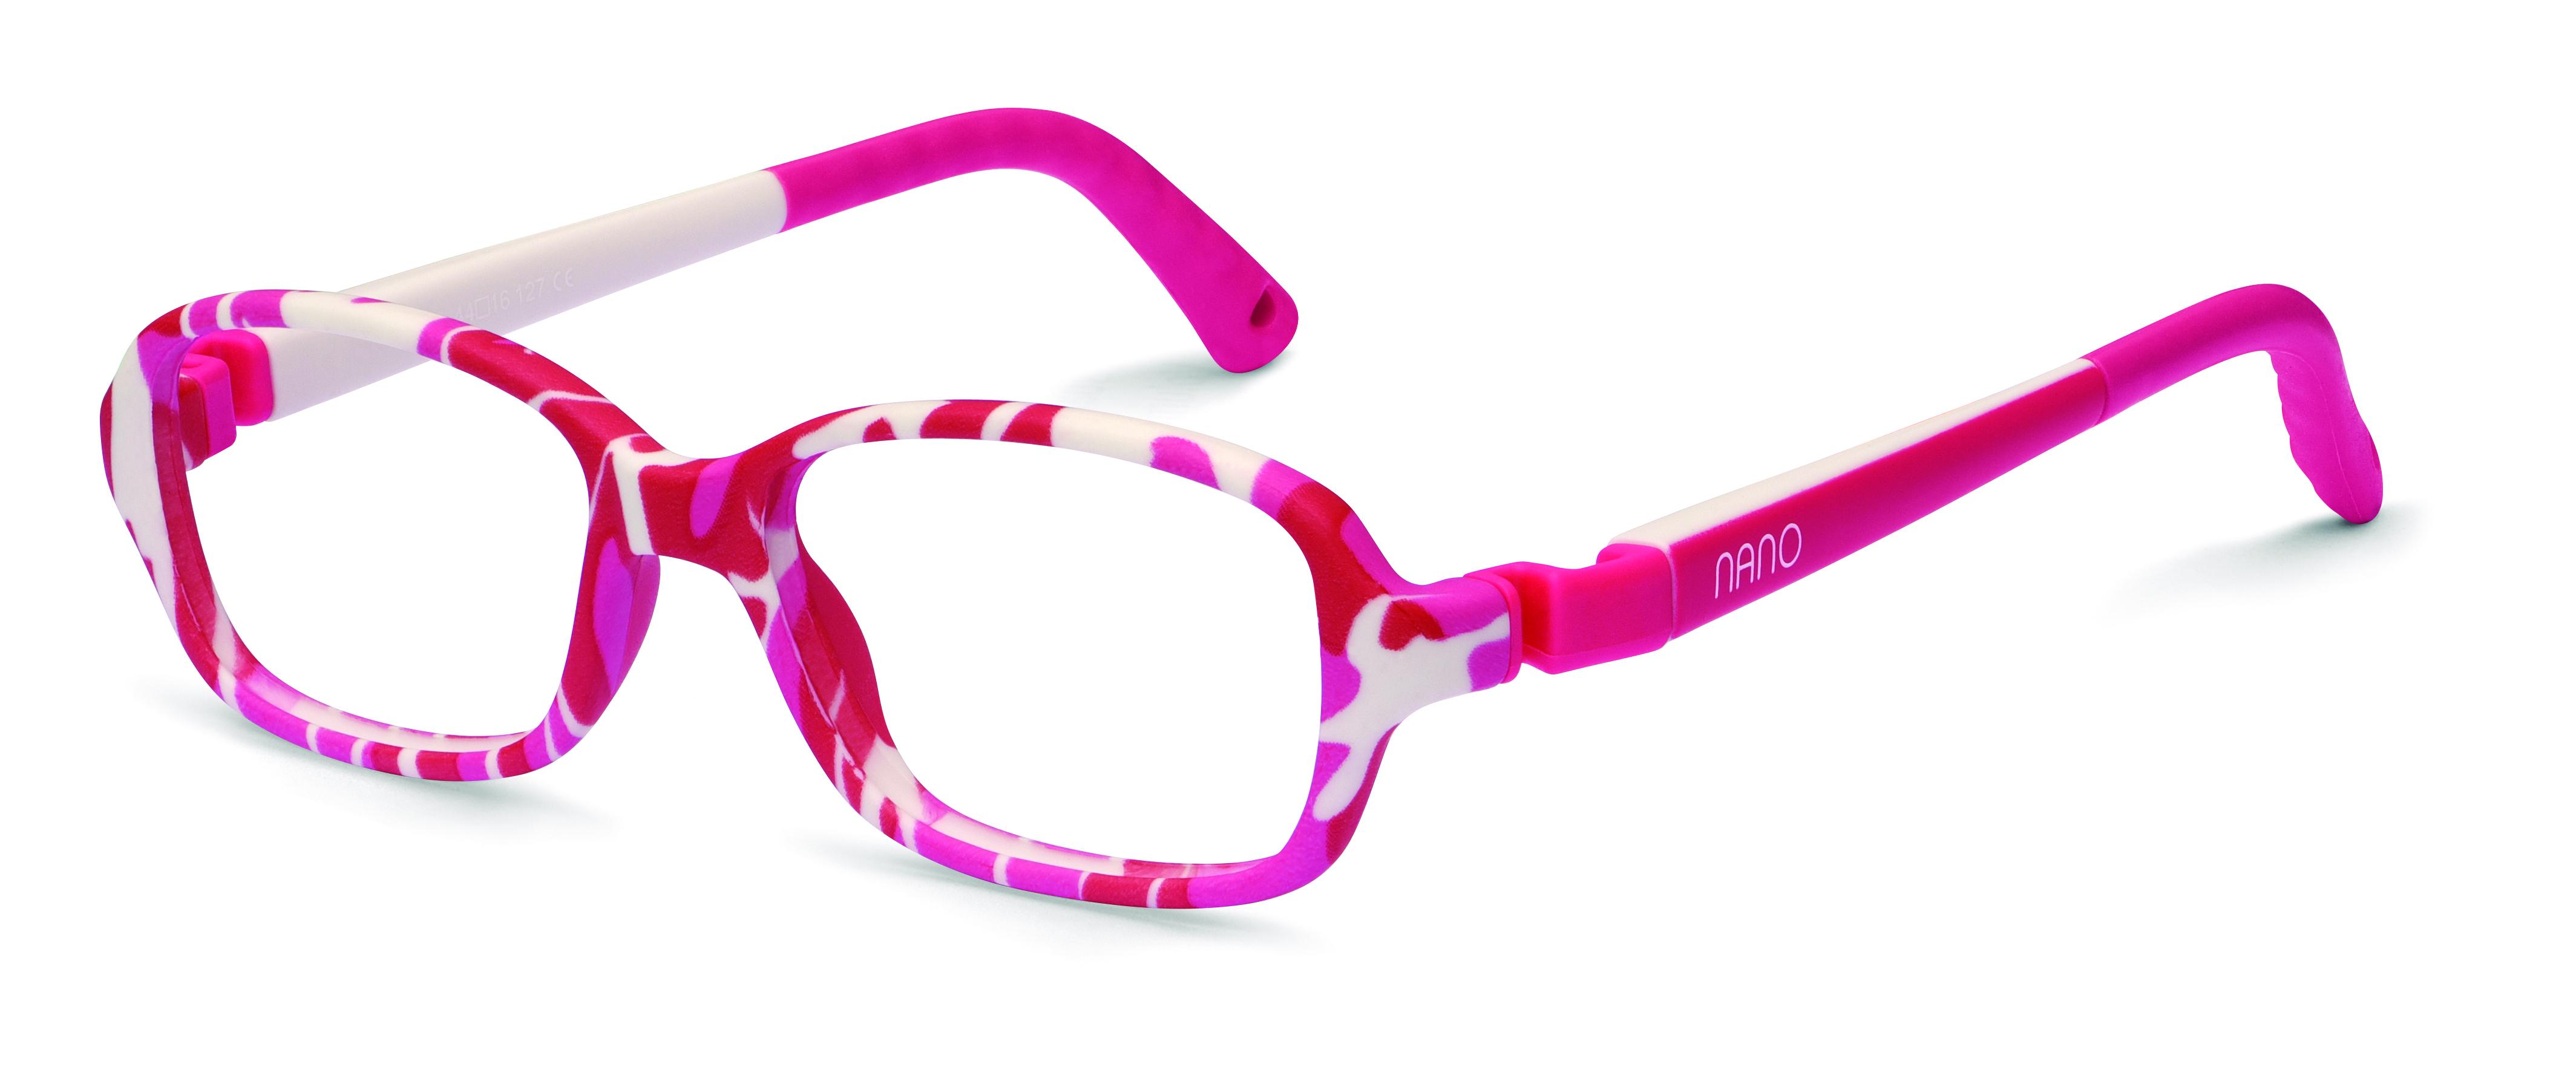 8818be2e59 Nano NAO50155 Re-Play Kids Eyeglasses Camouflage Pink White Eye Size 44-15  (6-8 Years) NAO50155 - Optiwow